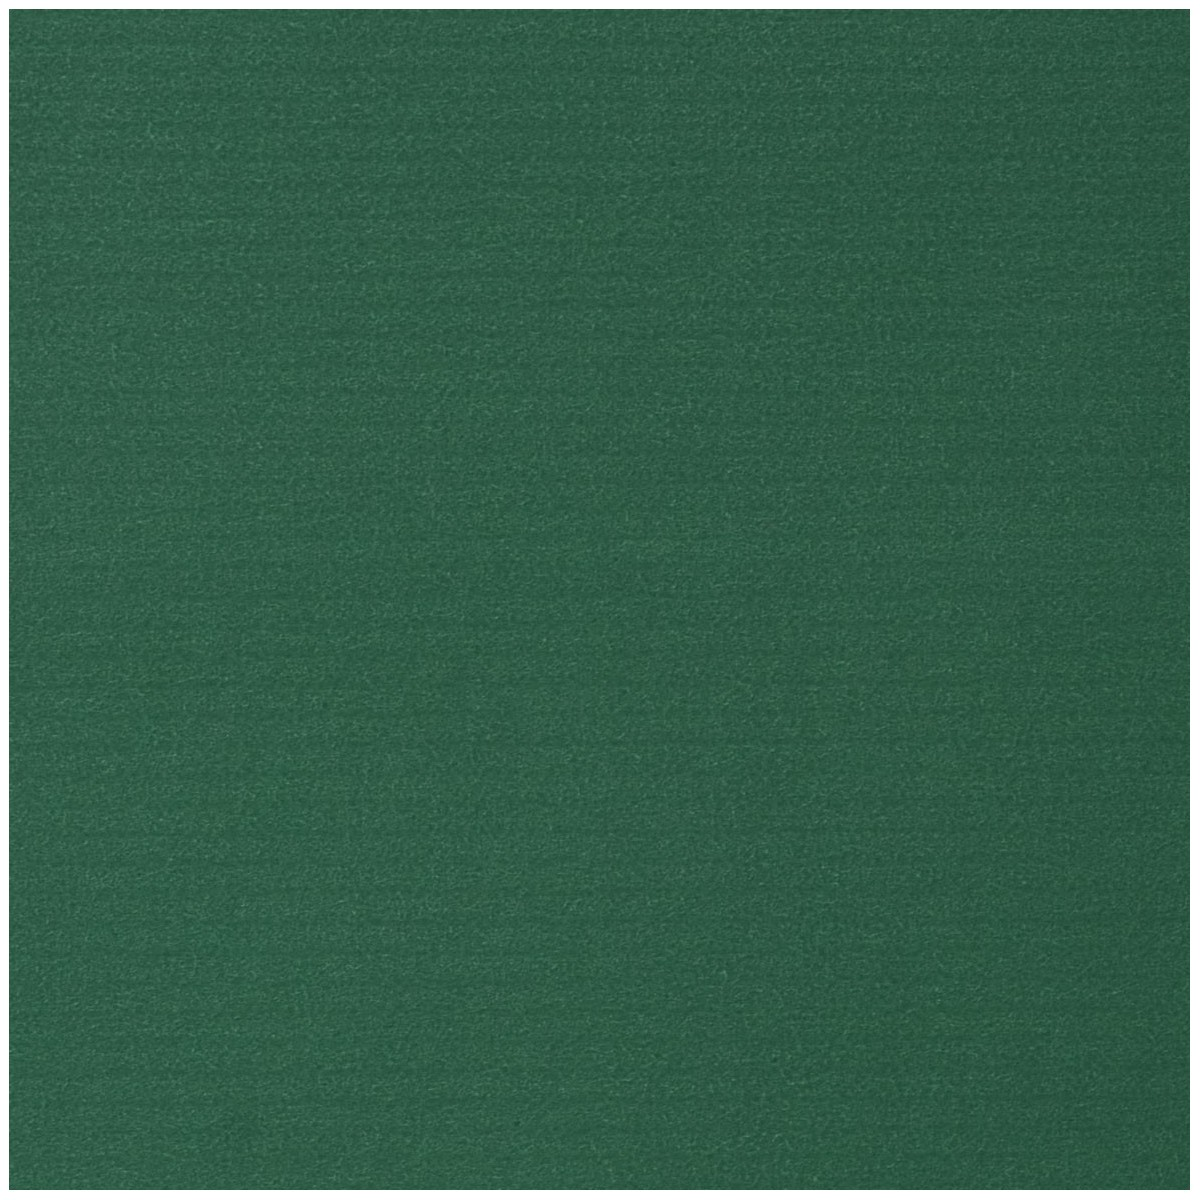 Carta Sealing Bianco ECOWHITE Gr.60 Fogli Cm.70x100 Colori Tinta Unita (al Kg.) Verde Scuro